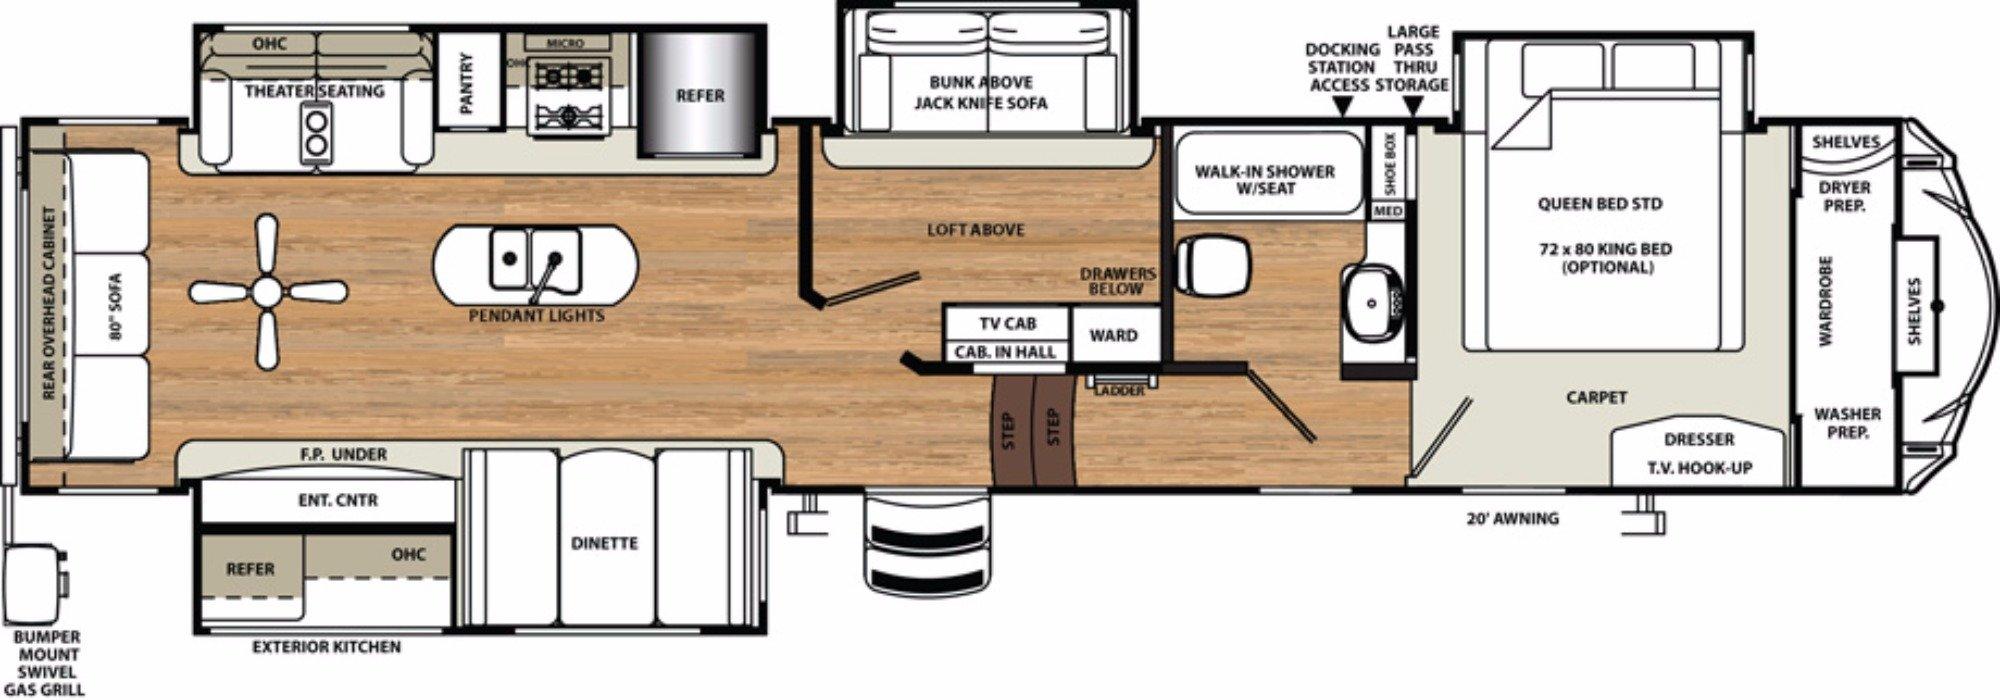 View Floor Plan for 2018 FOREST RIVER SANDPIPER 372LOK